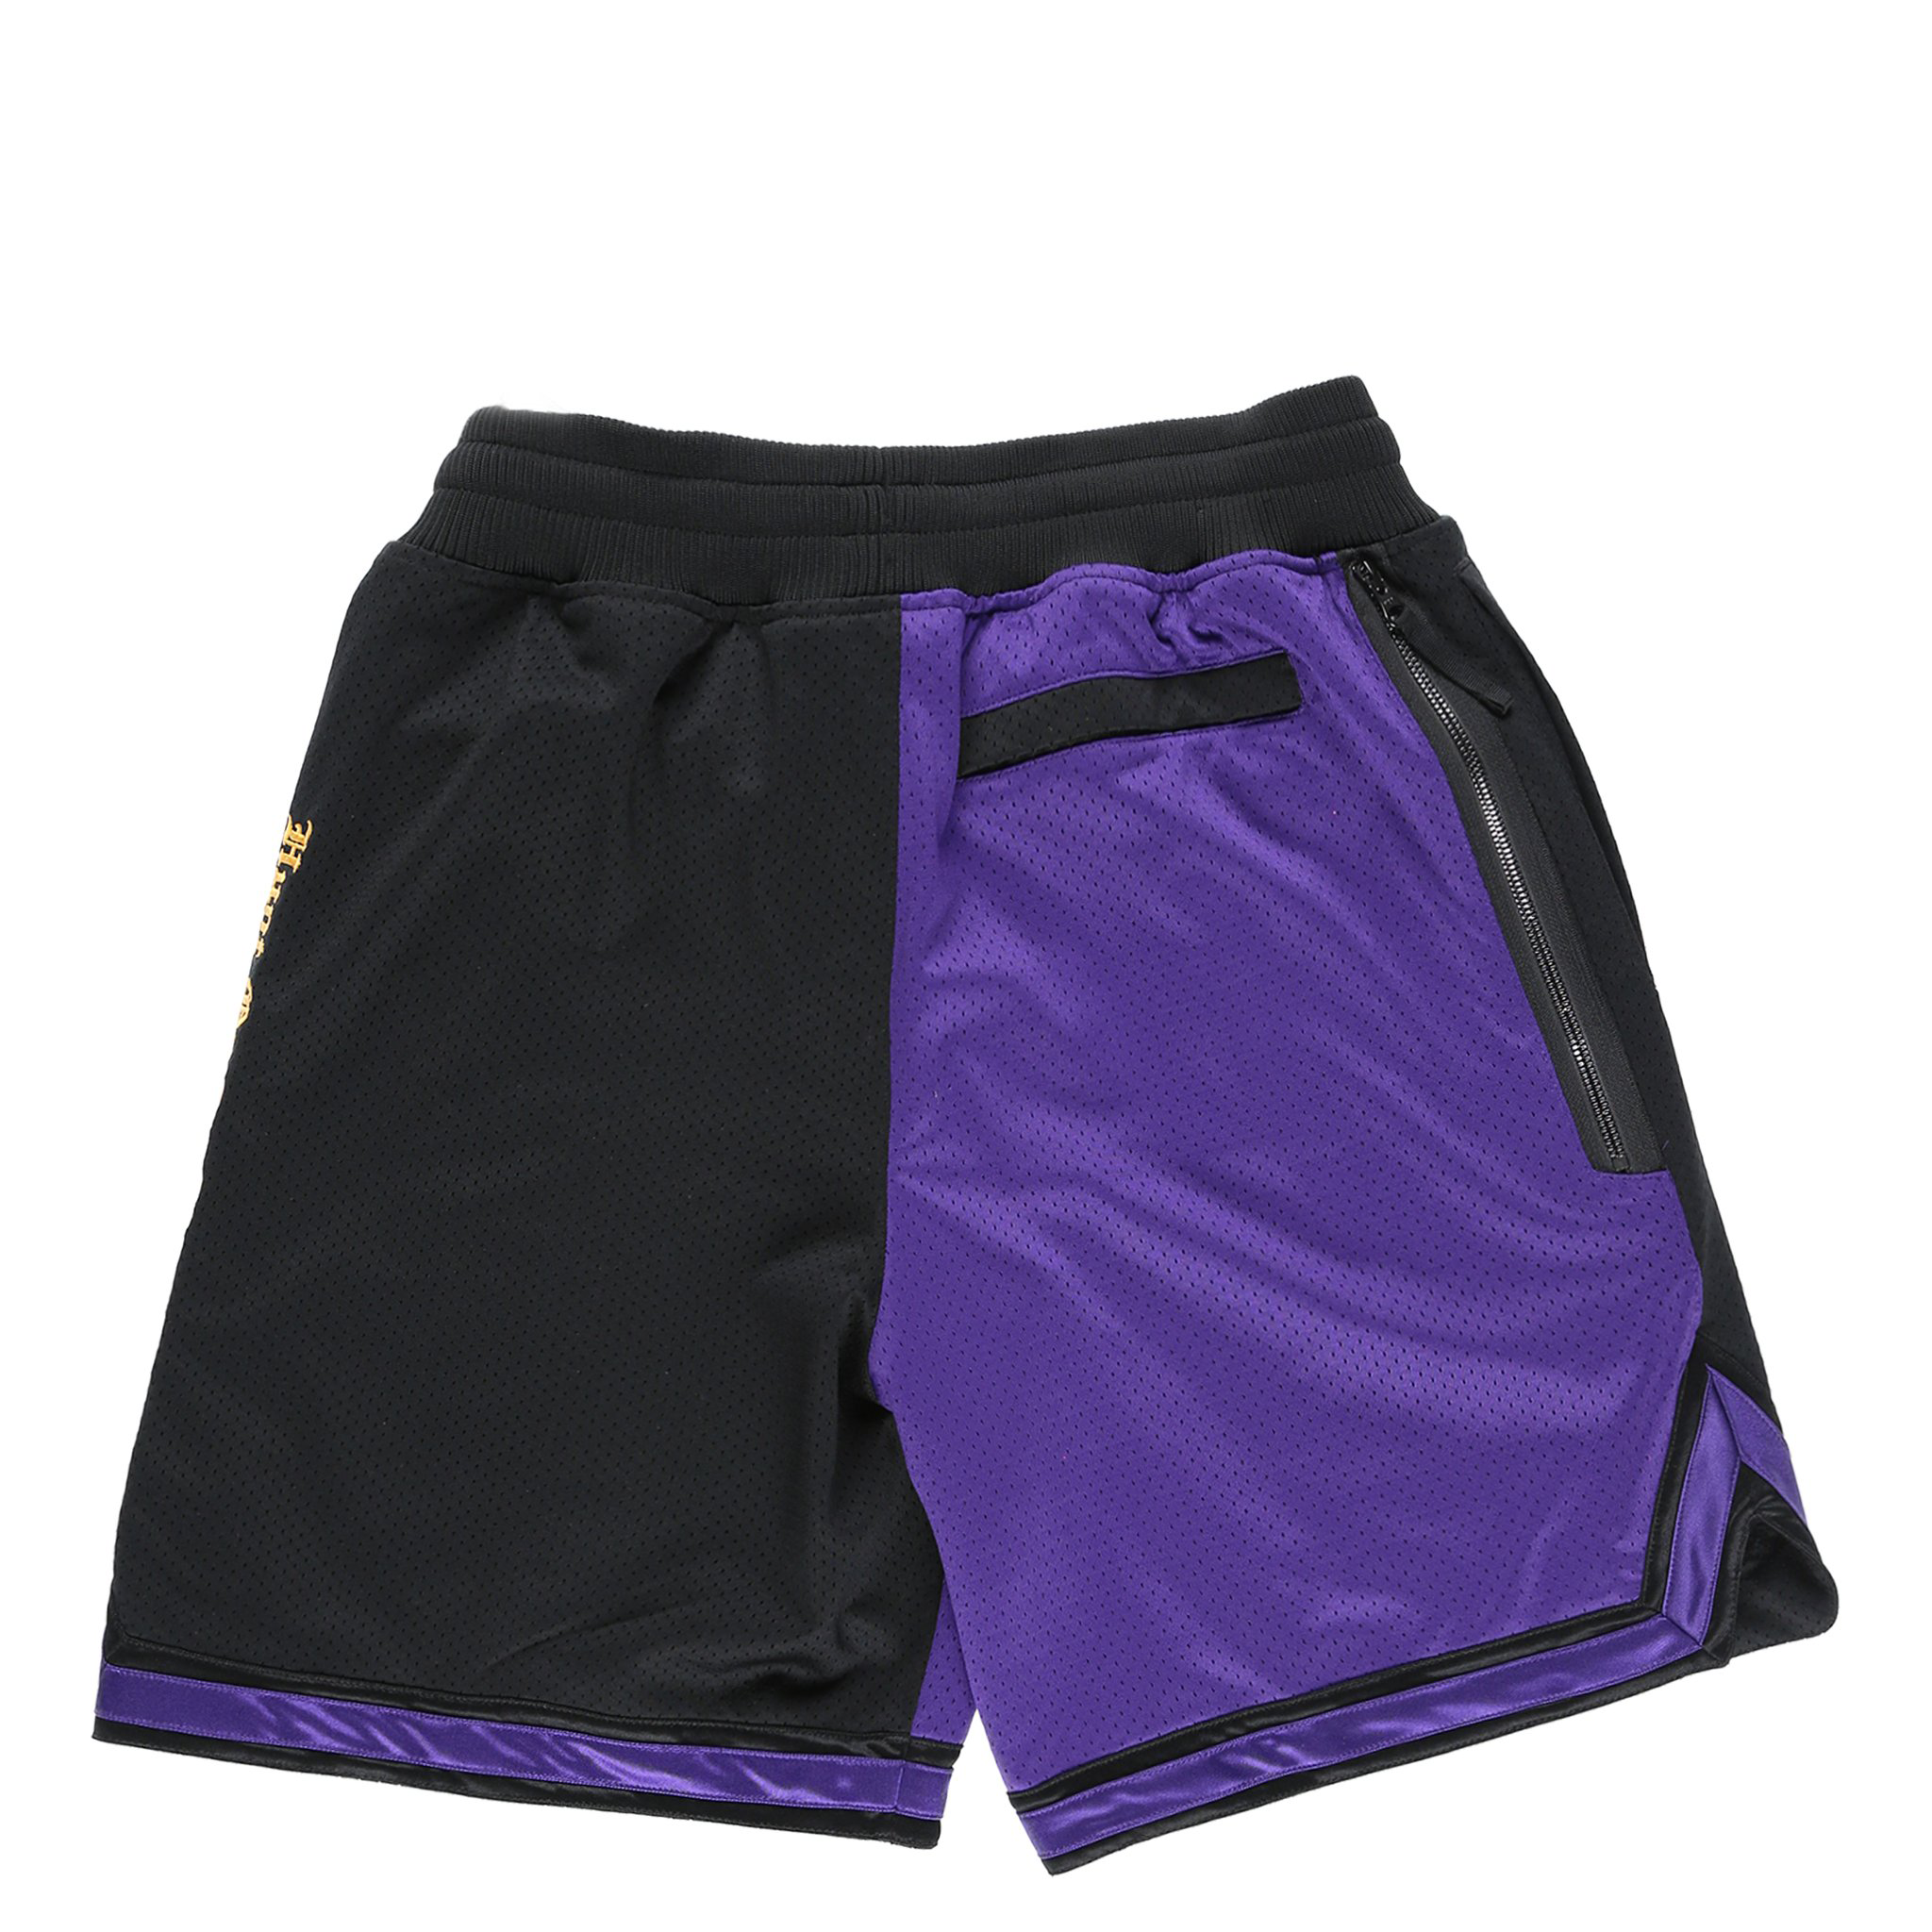 Nike Lebron x Atmos Shorts Black/Court